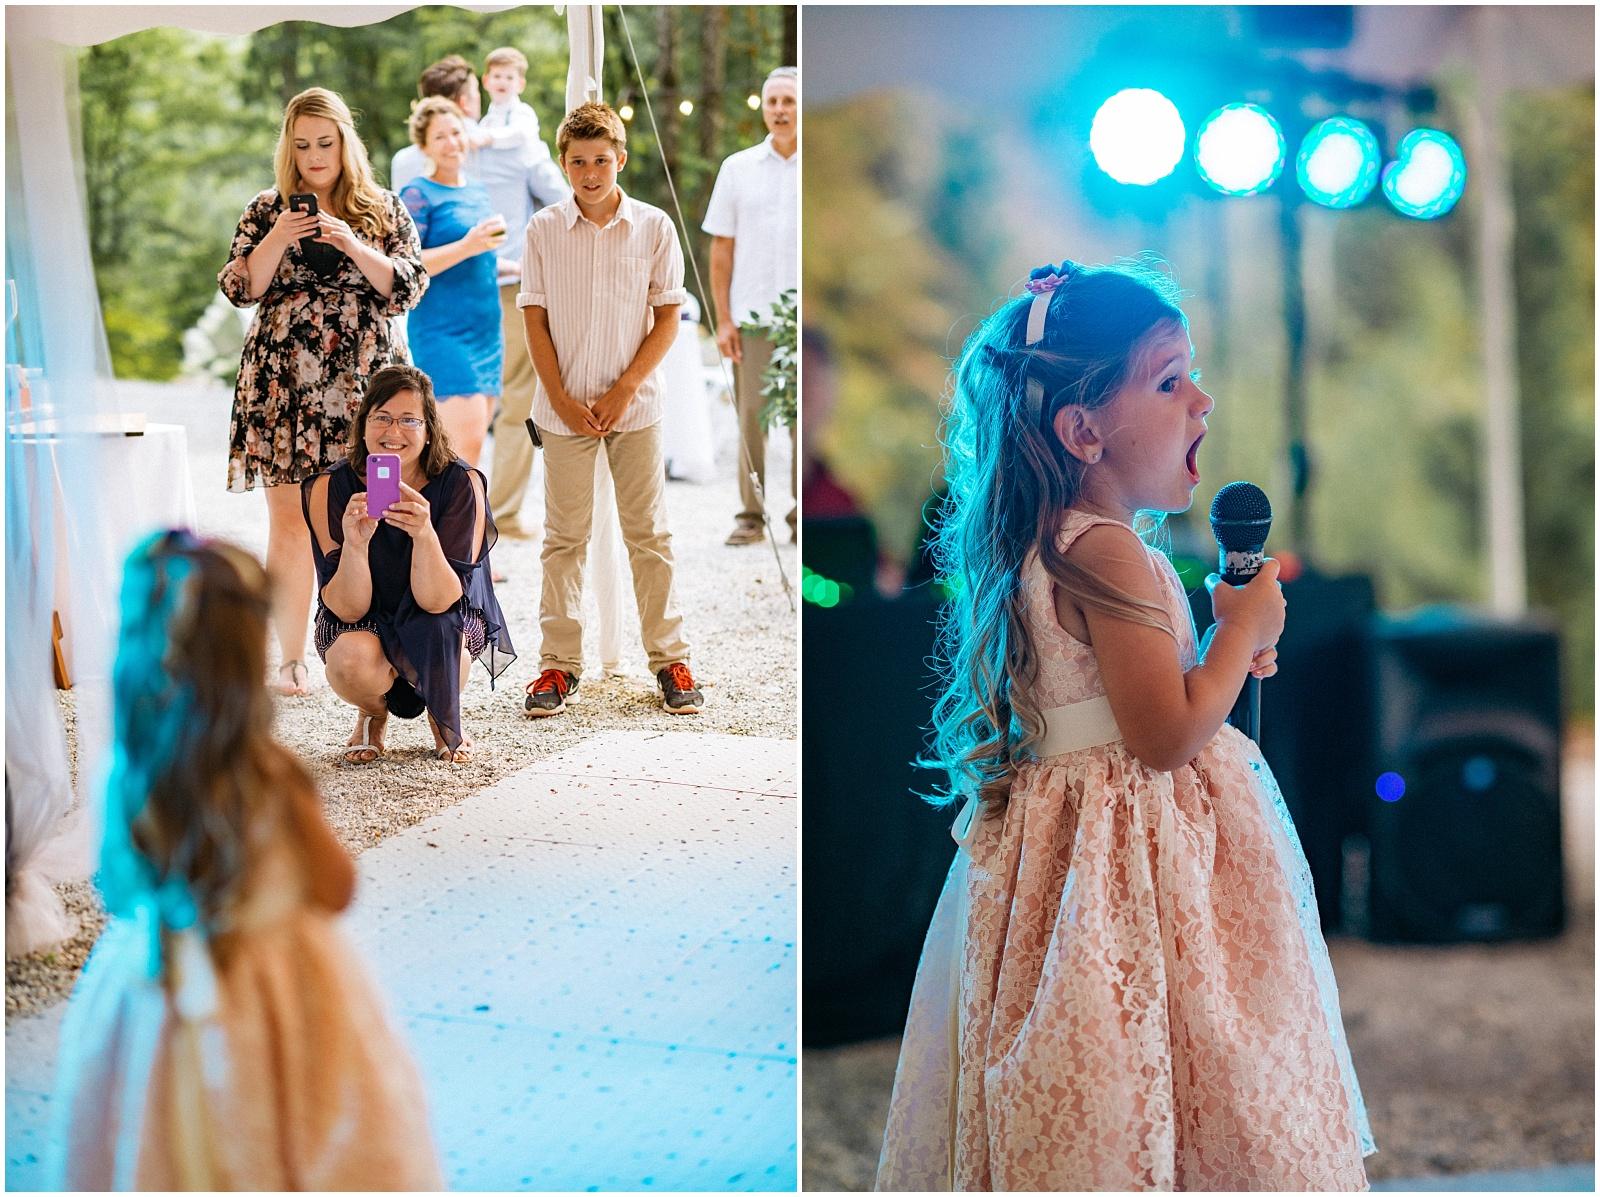 Ryan_Rechelle_Nantahalla_Weddings_Andrews_NC-185_Ryan_Rechelle_McGuire's_Millrace_Andrews_NC.jpg